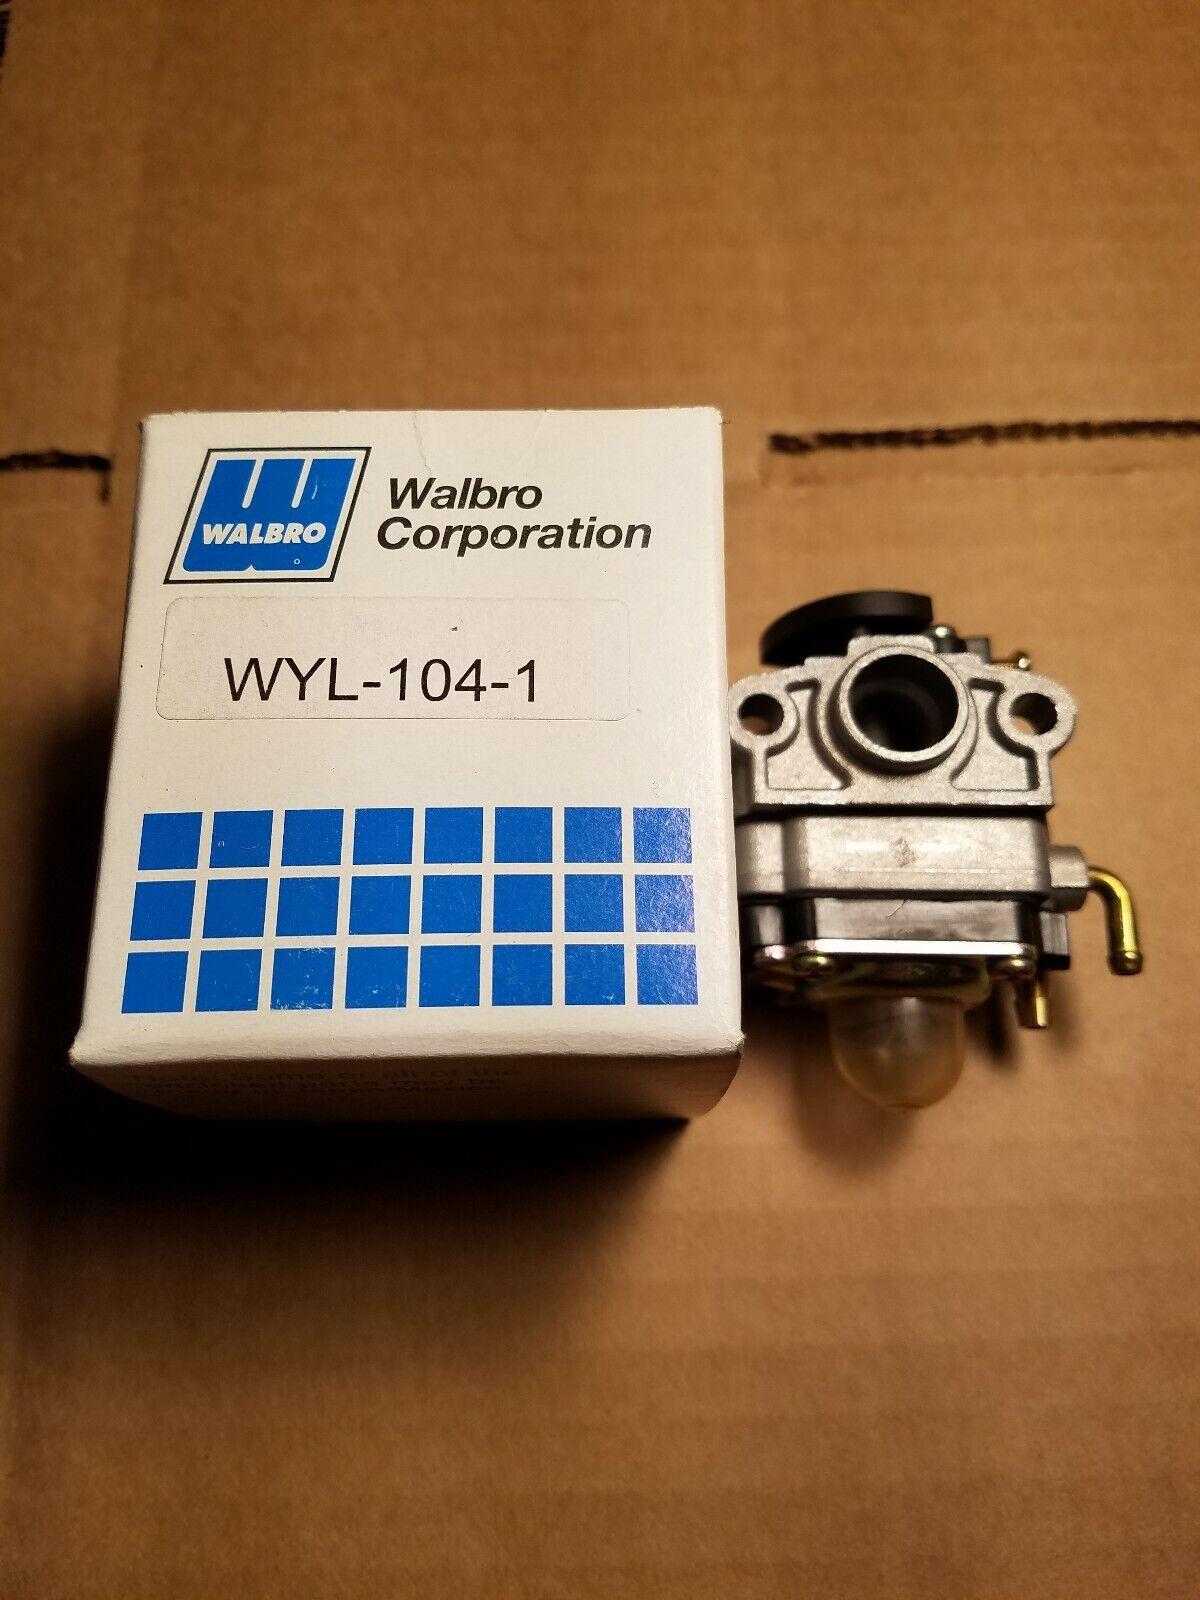 WALBRO WYL-104-1 Cocheburador para ROBIN BRUSHCUTTER con Herramienta gratuita Walbro W